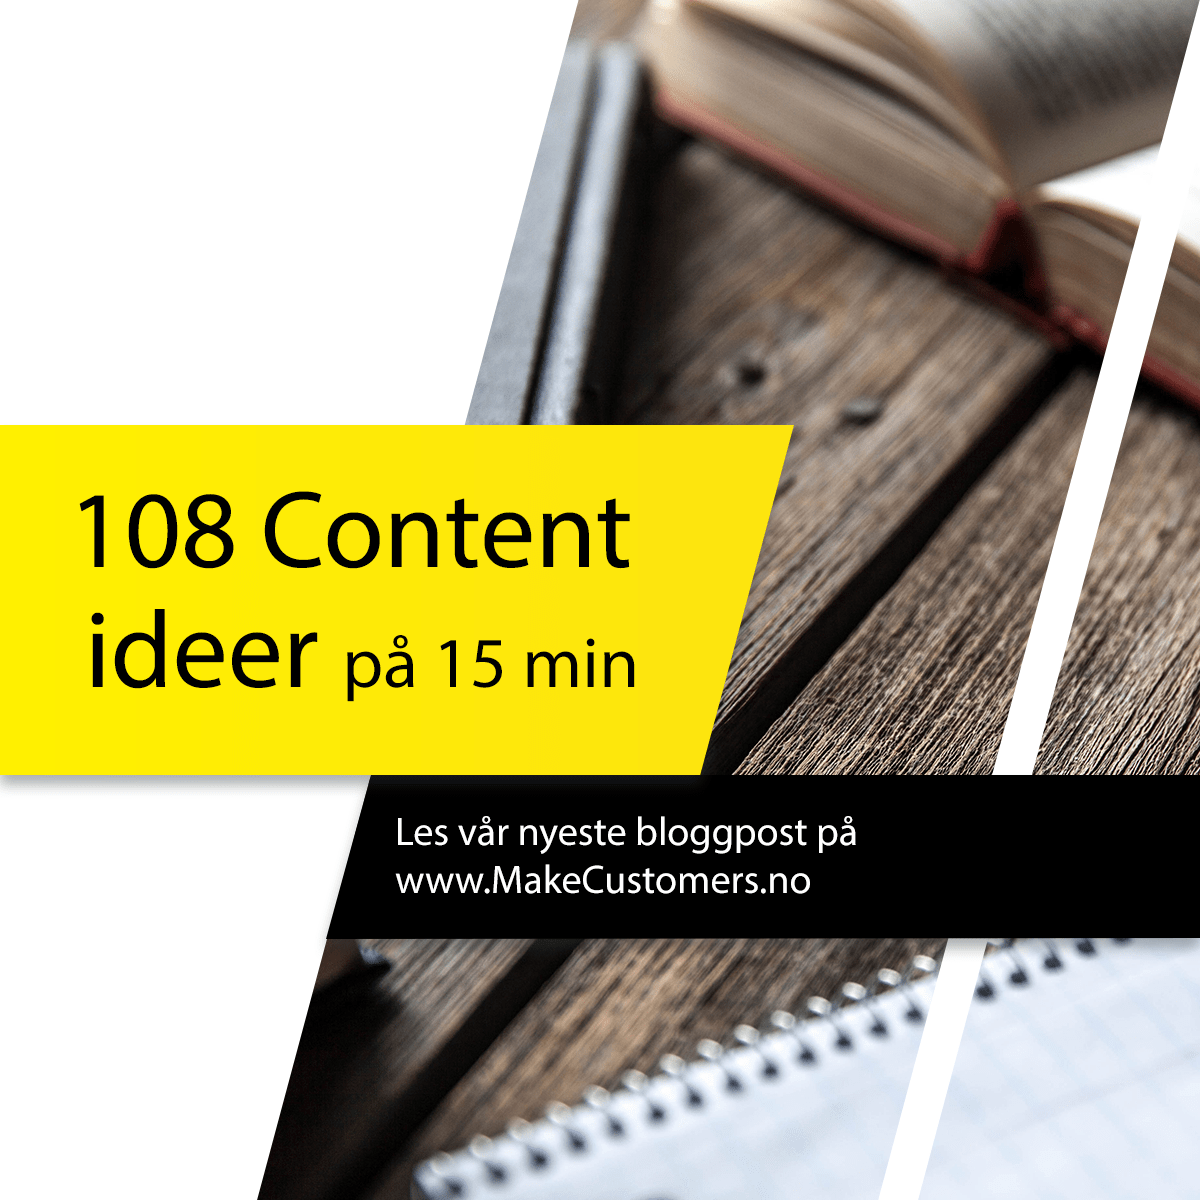 108 content ideer på 15 min til blogg og nyheter på din hjemmeside